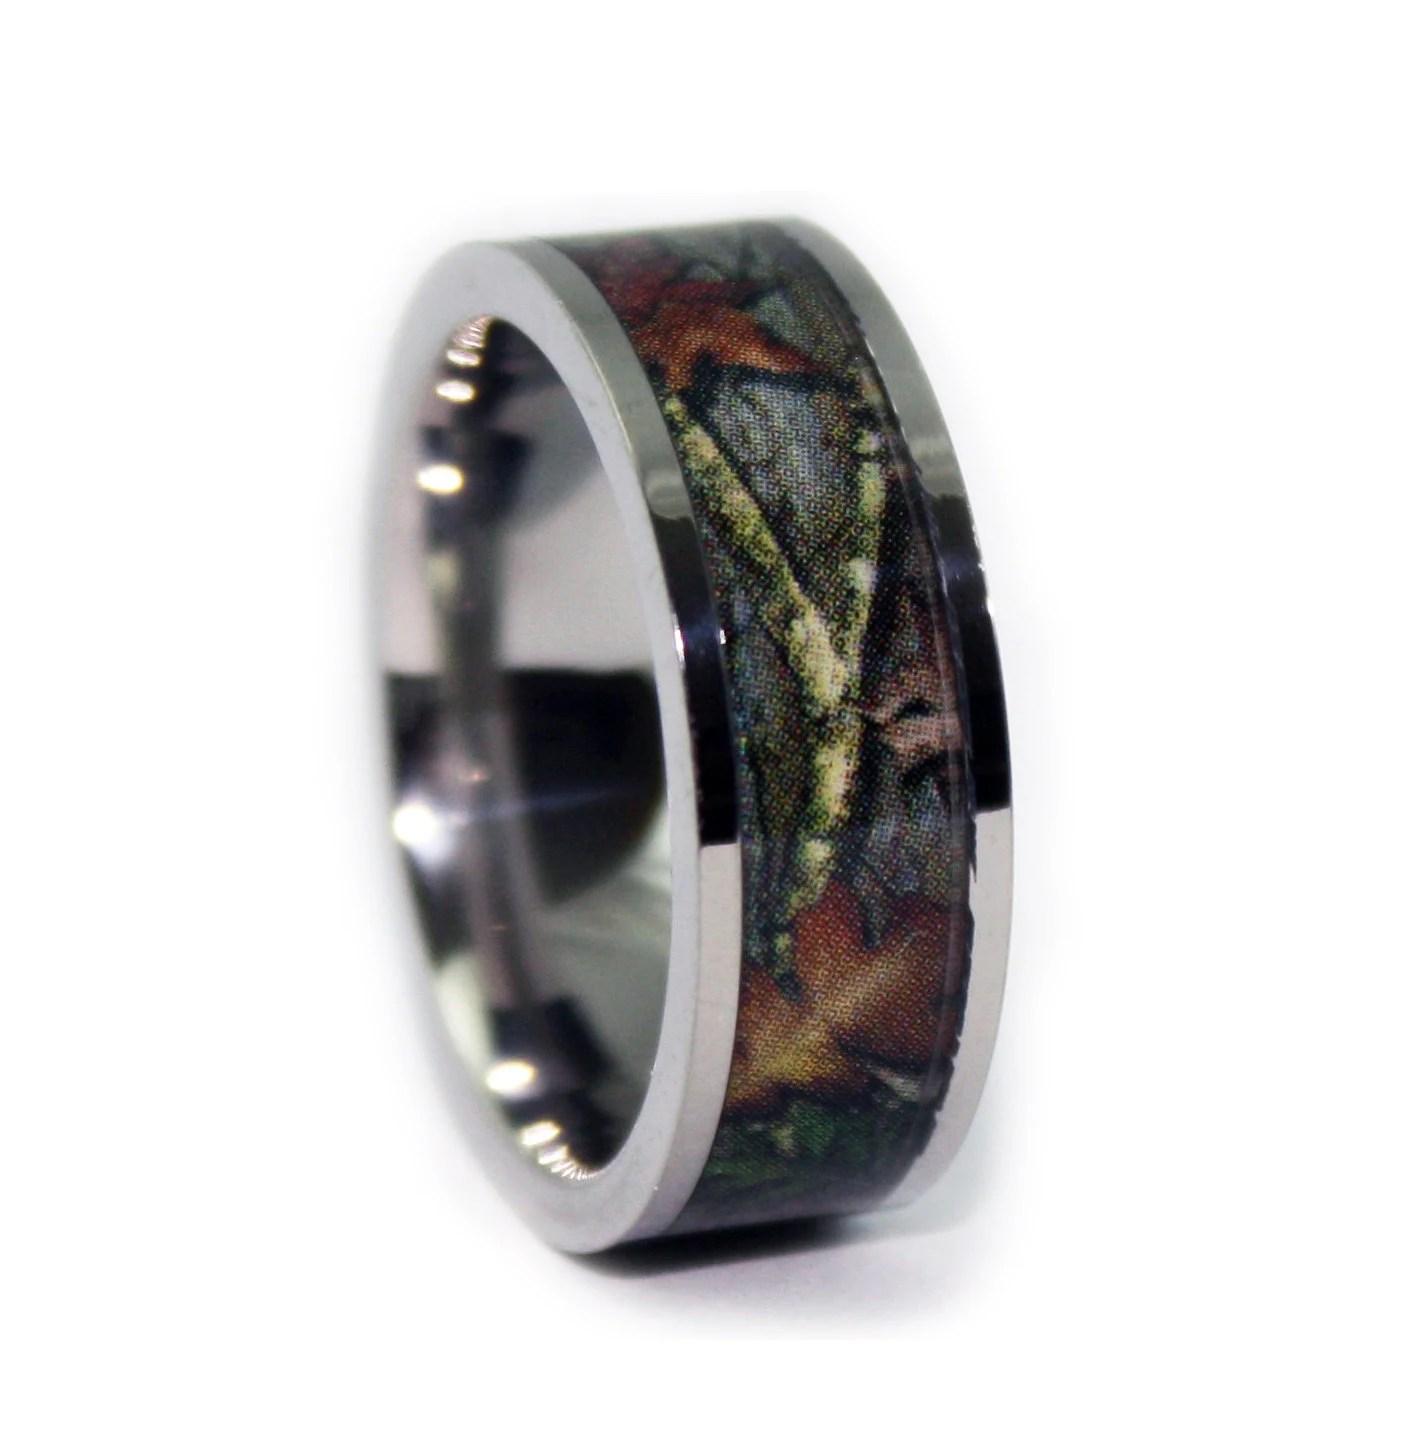 camo wedding rings camo wedding band sets Camo Wedding Rings by ONE CAMO Flat Titanium Mens Wedding Band Camo Engagement Rings